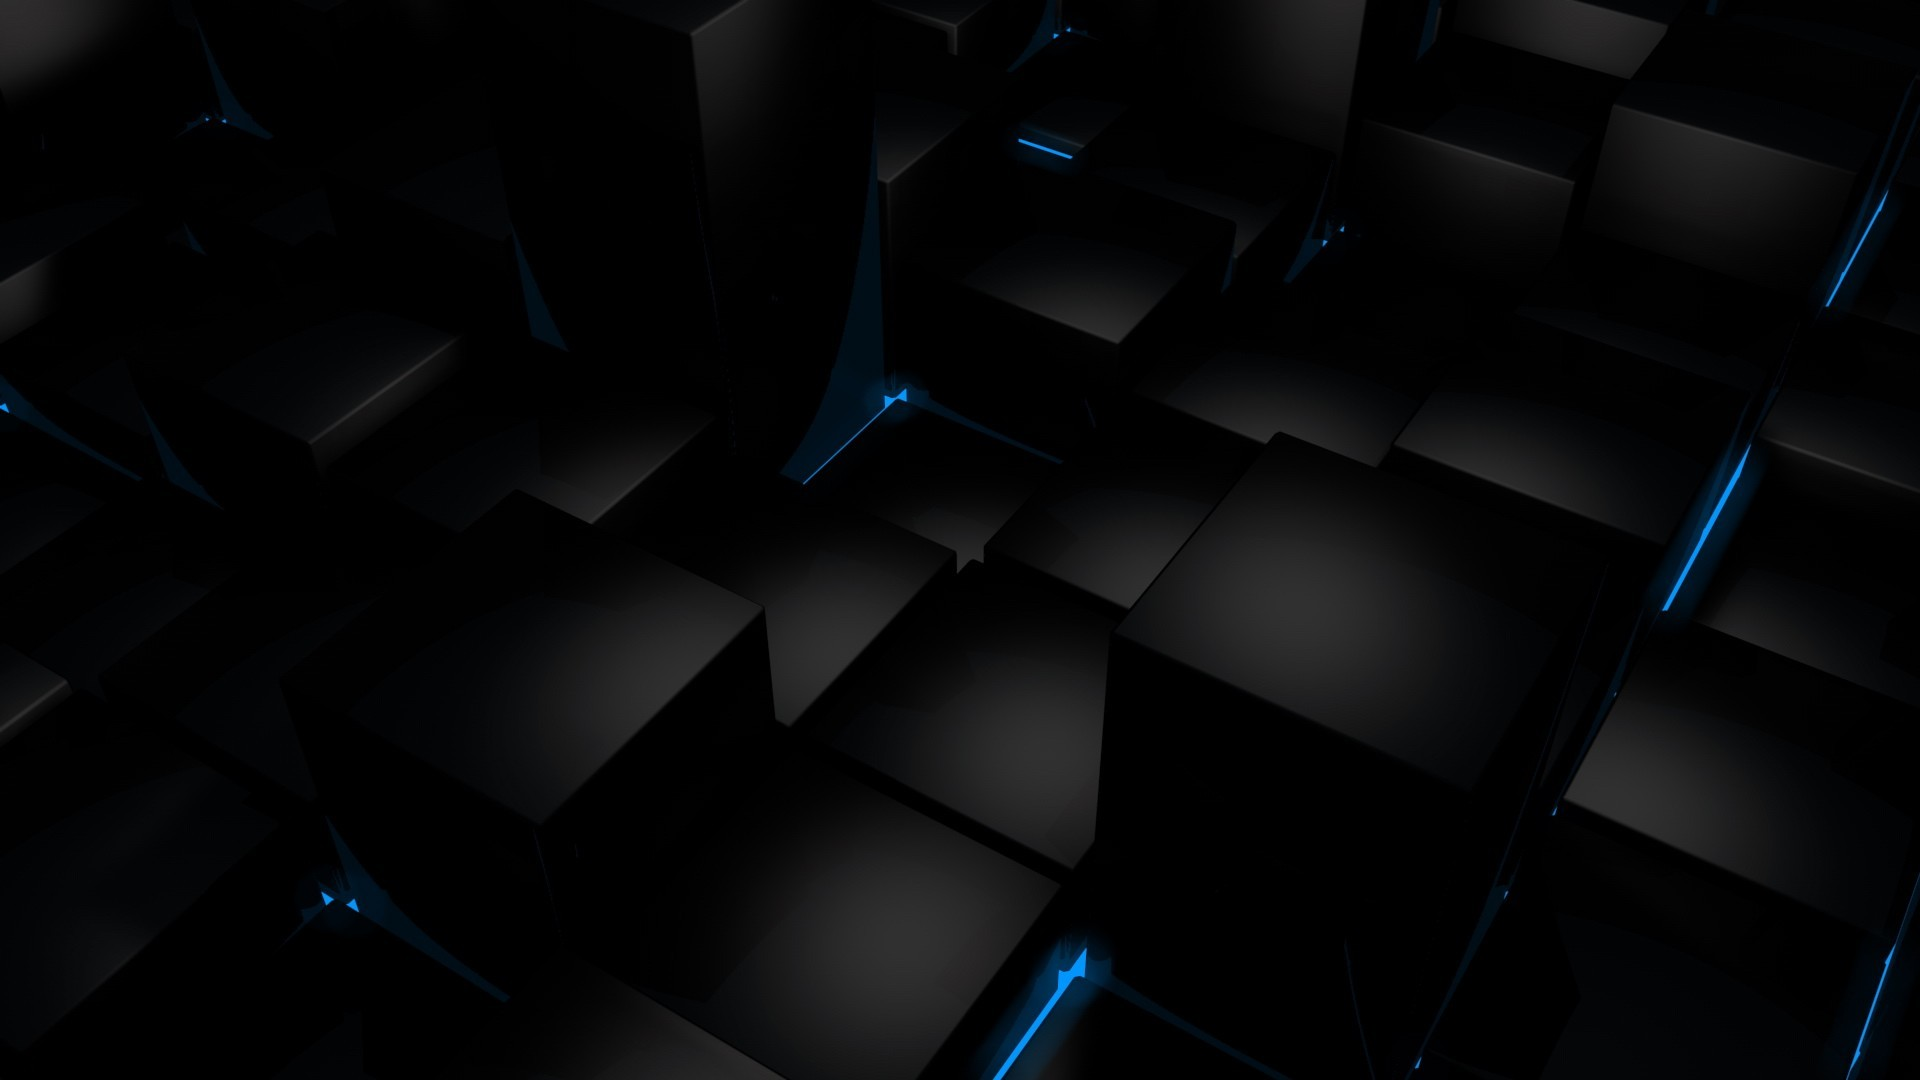 The best 3d HD wallpaper ever??   HD wallpapers